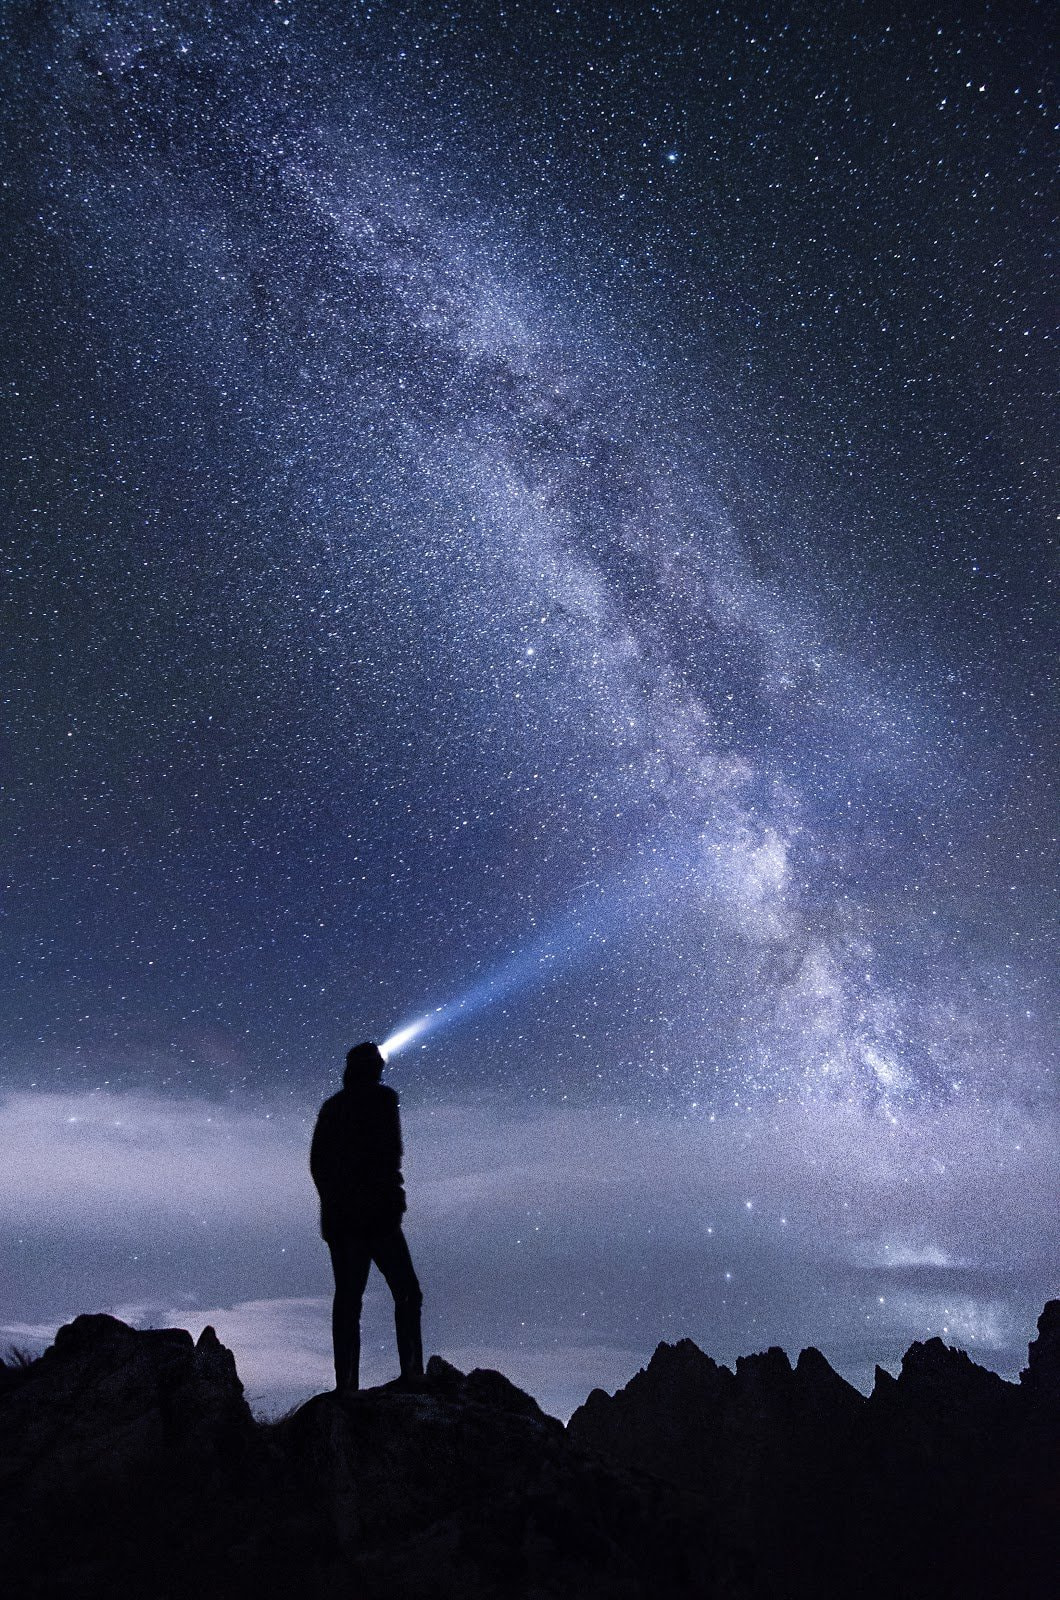 Milky way night sky with silhouette of a person looking up by Stefan Štefan Štefančík